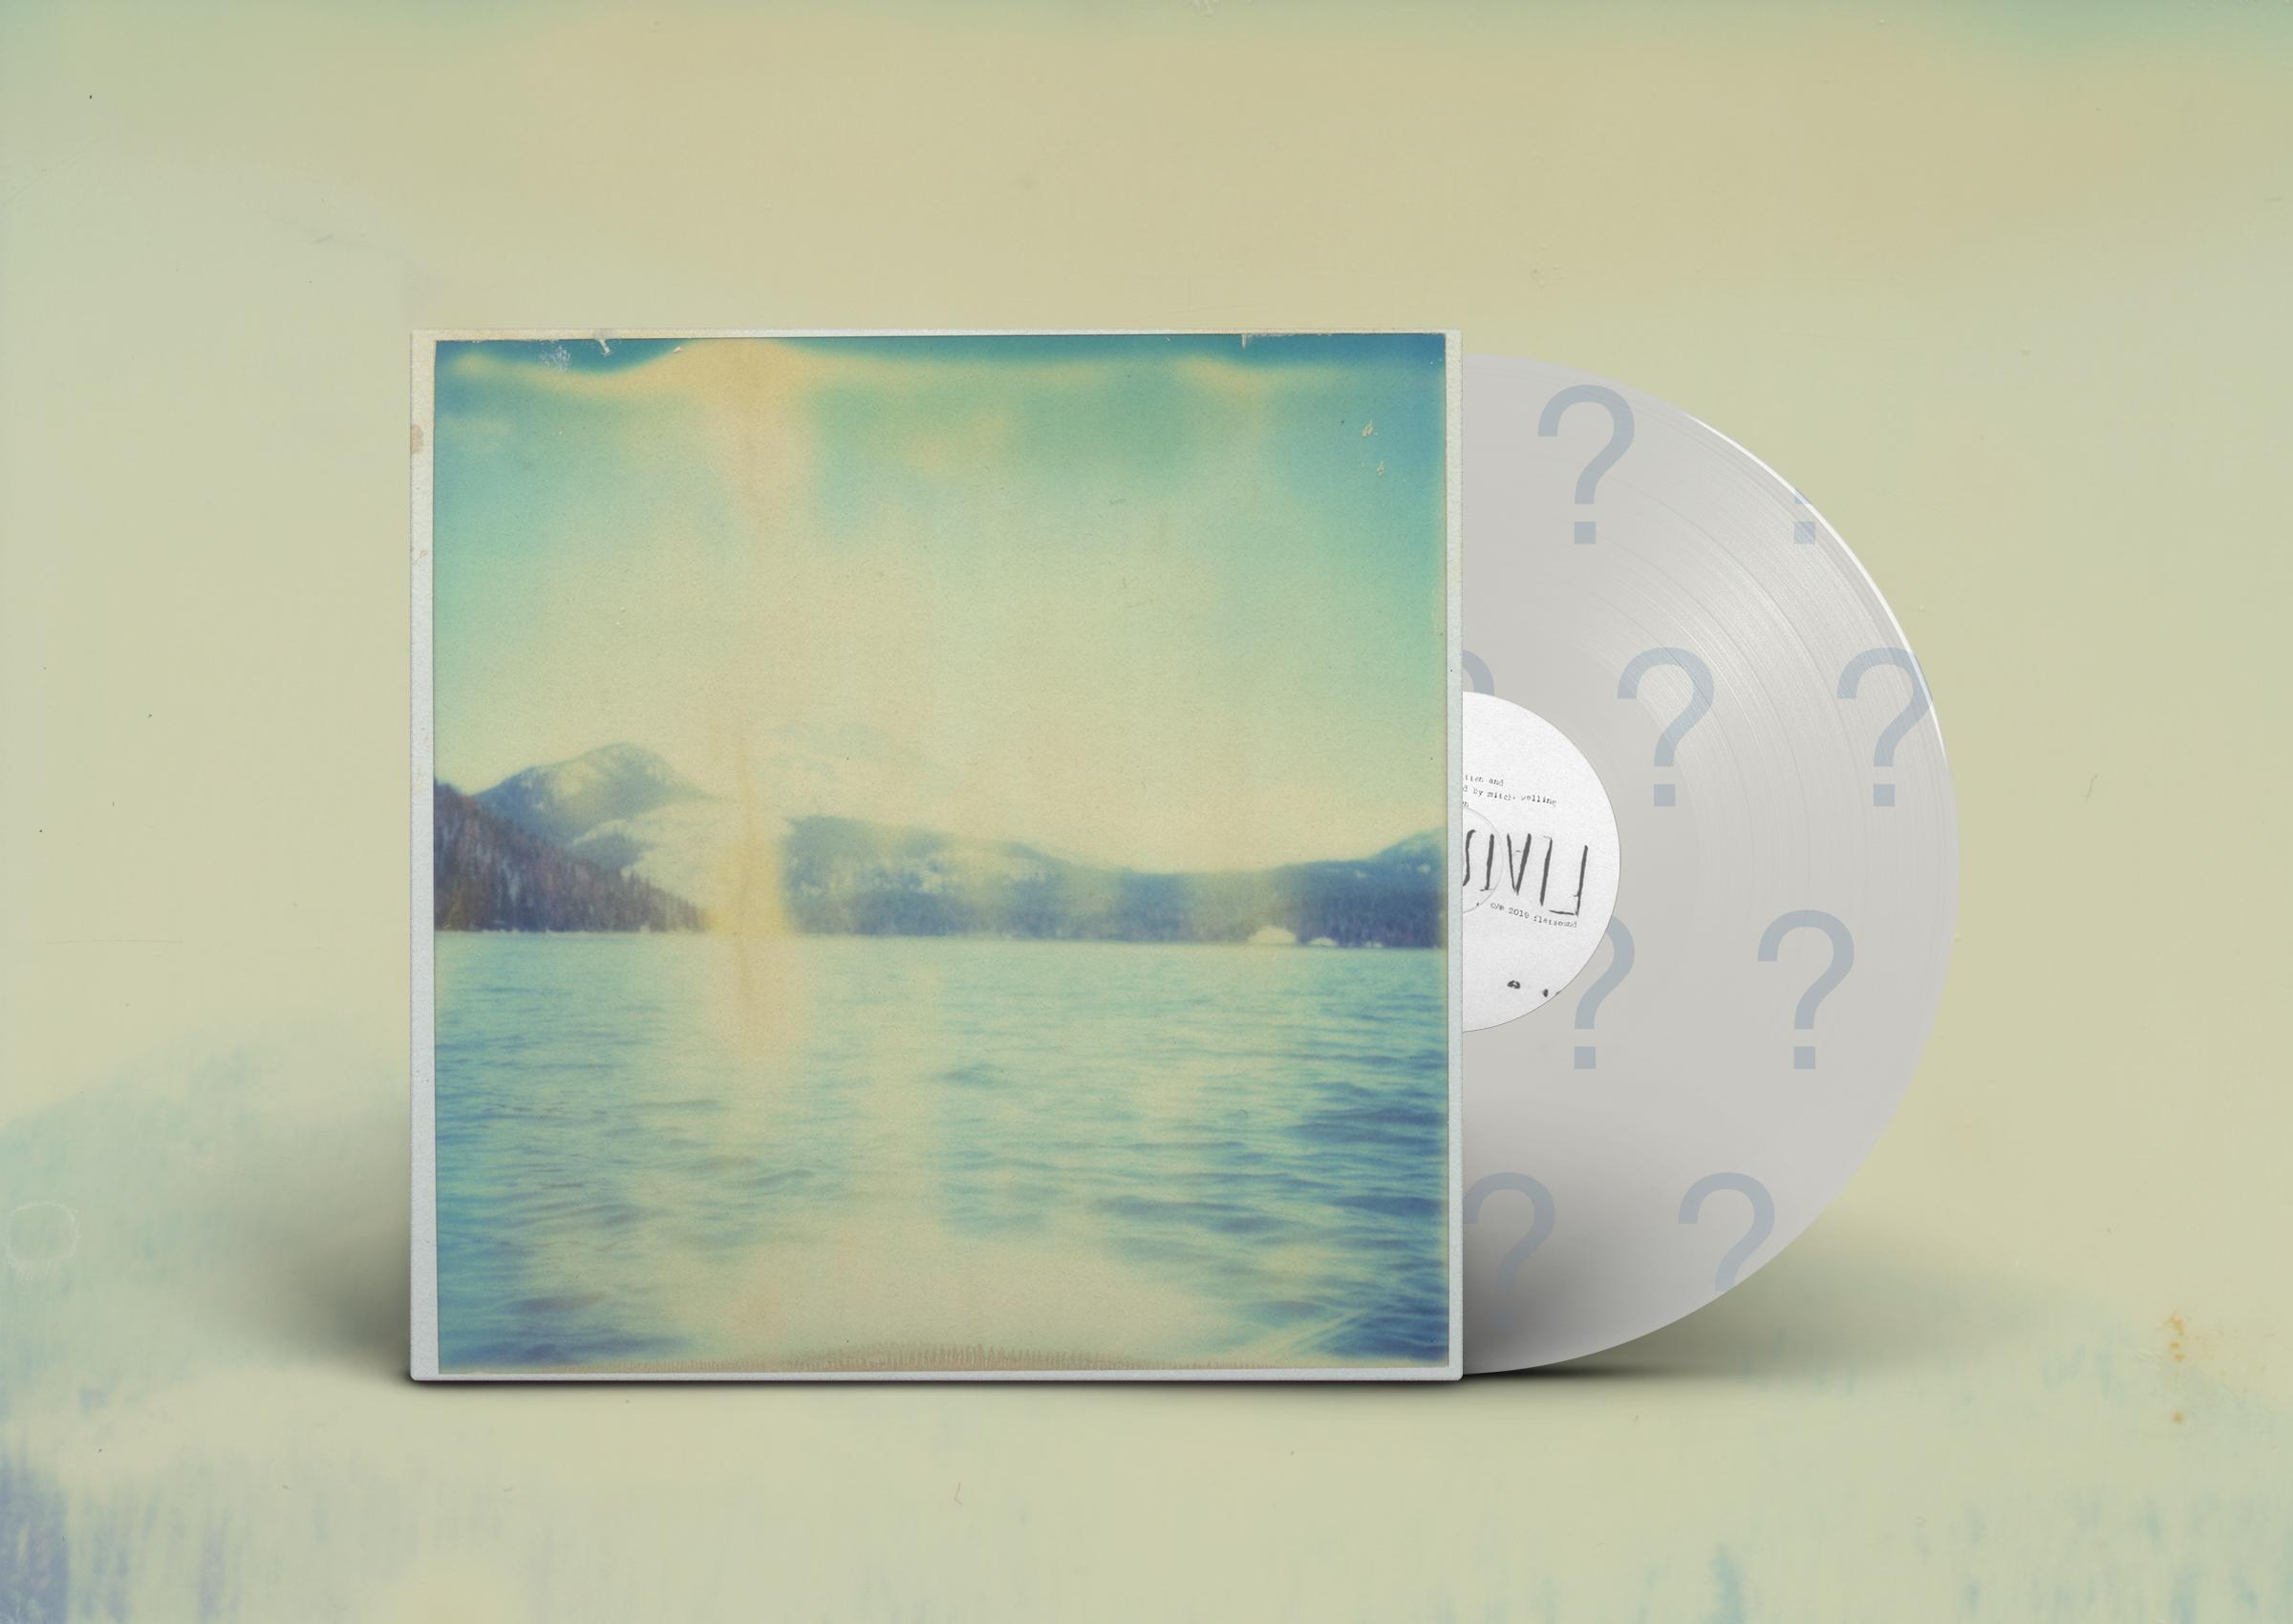 scotland on vinyl promo2.jpg